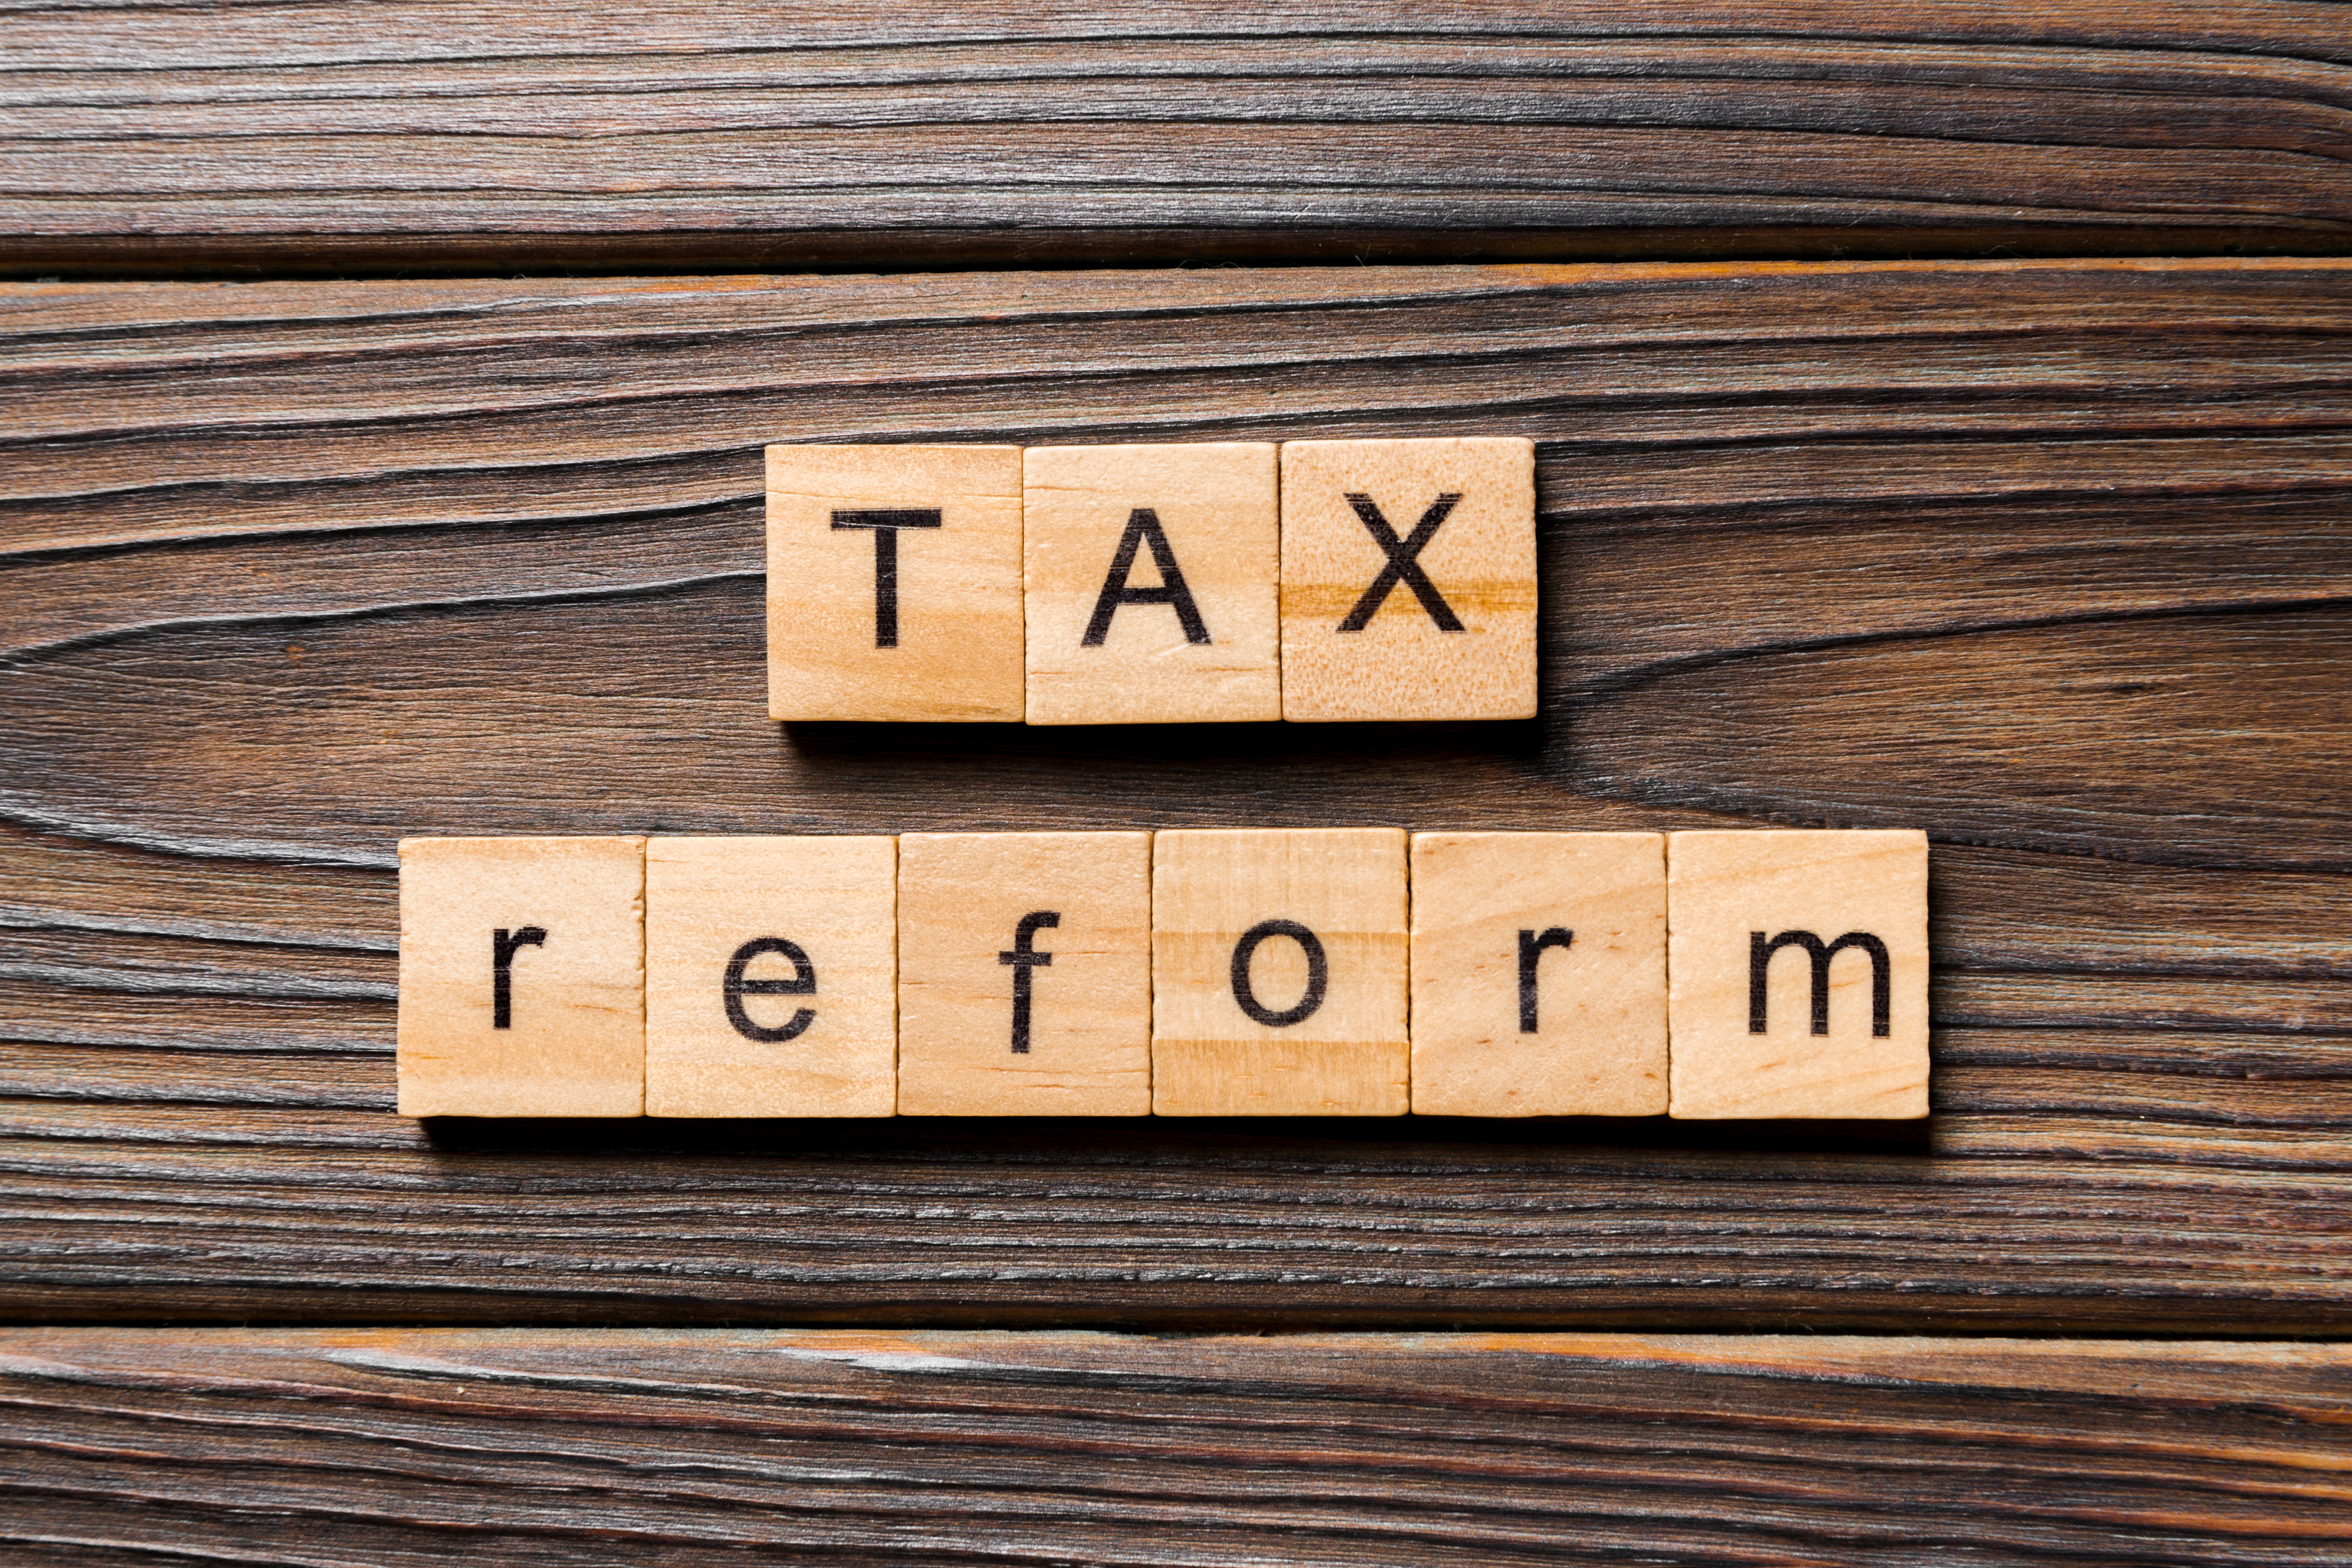 Biden Administration Details Plans for US Tax Reform 2.0